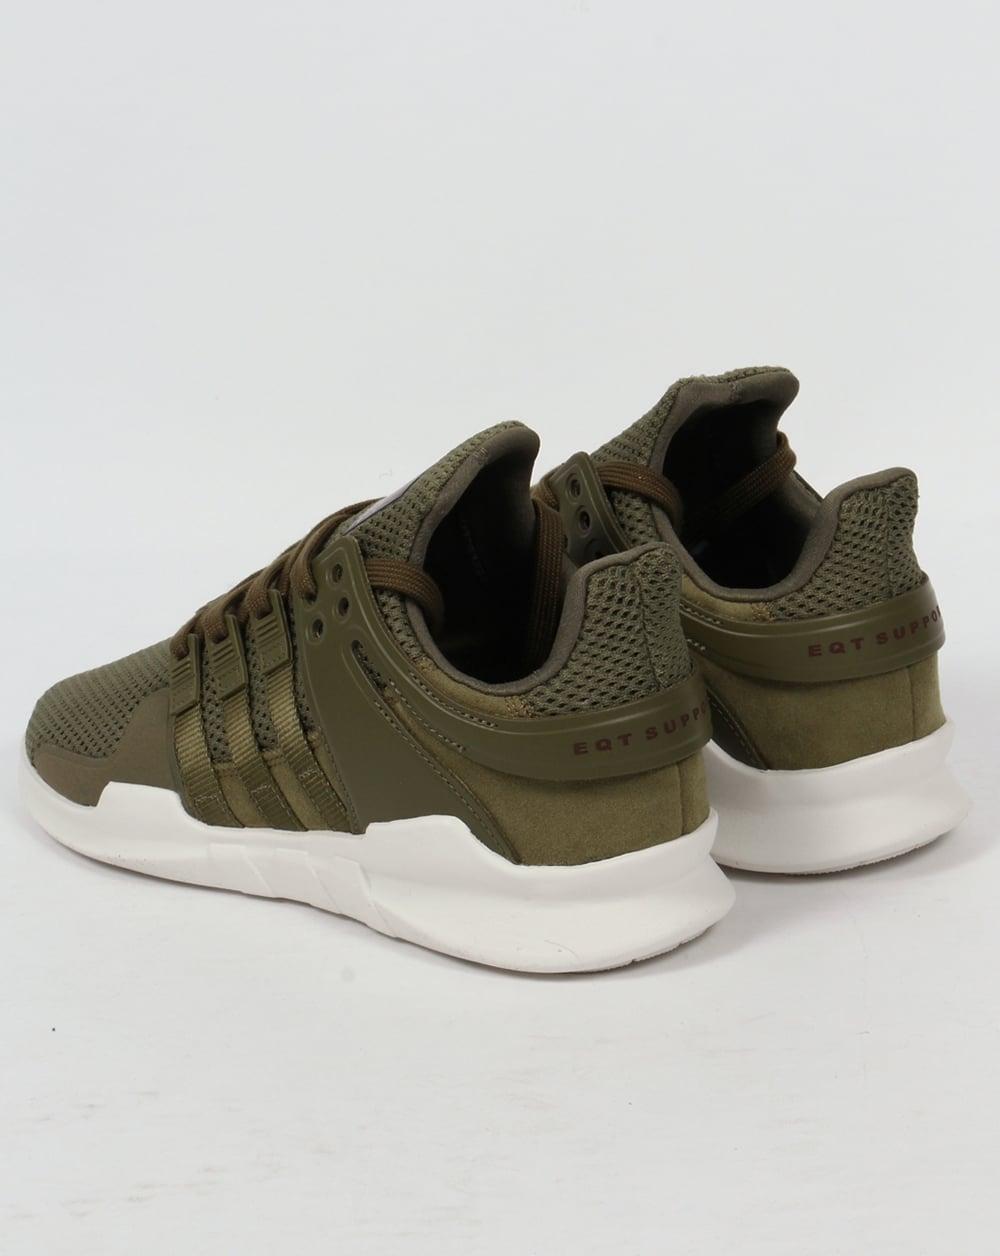 adidas khaki trainers. adidas equipment support trainers olive cargo khaki